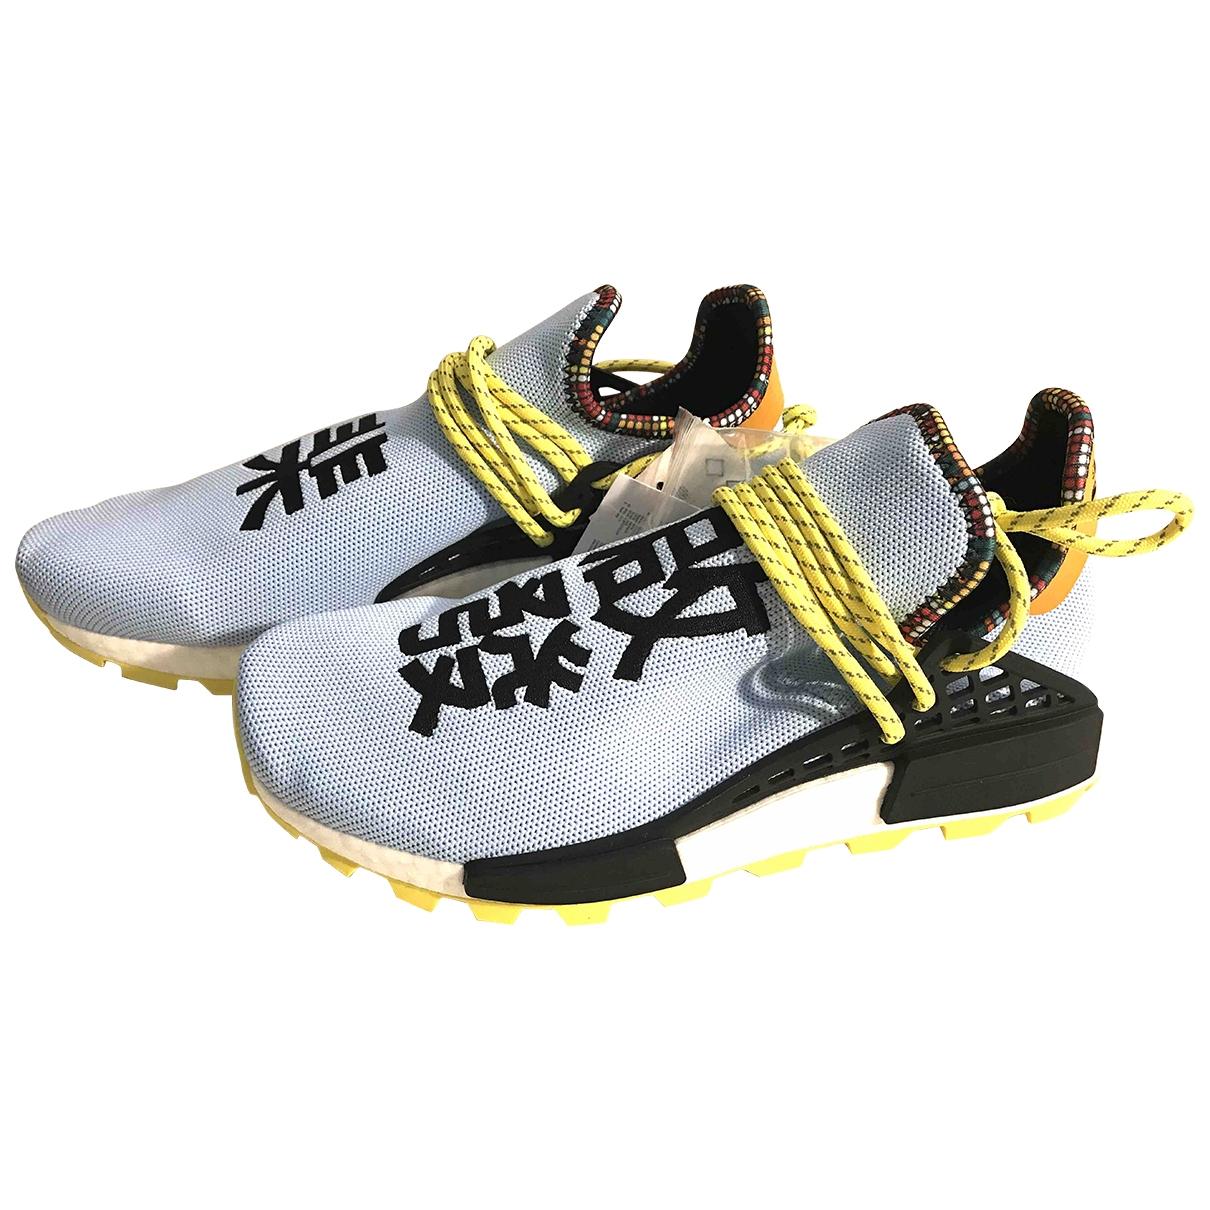 Adidas X Pharrell Williams NMD Hu Sneakers in  Bunt Kautschuk